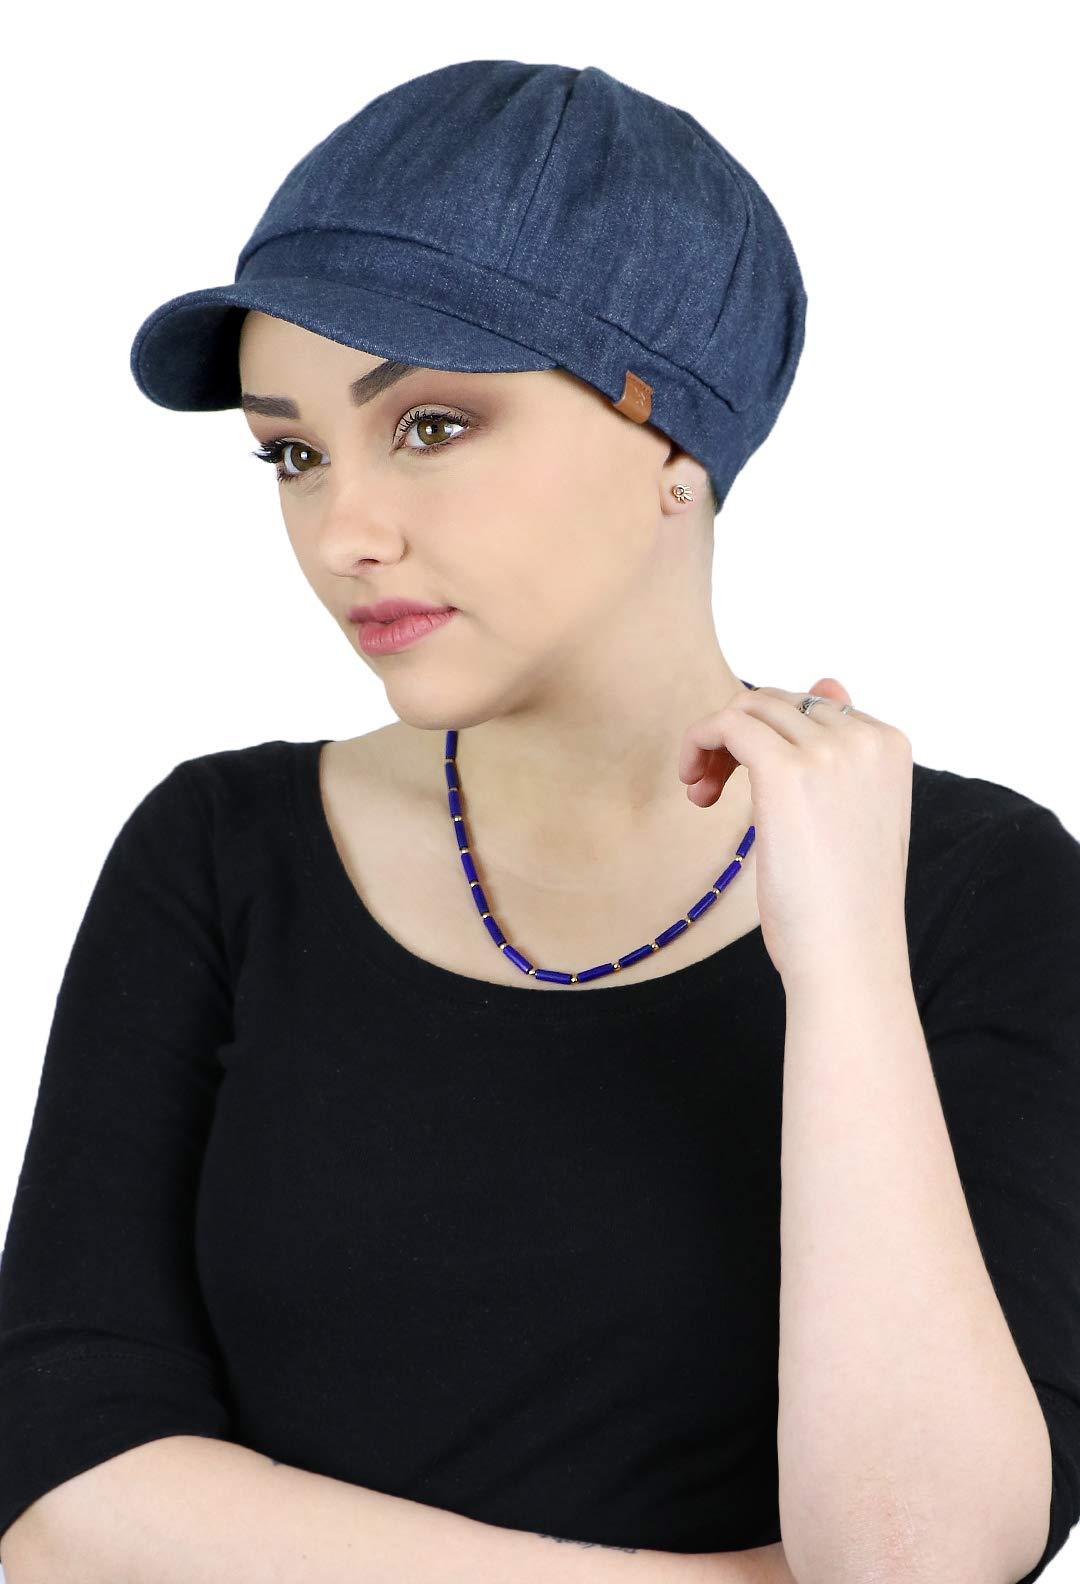 Newsboy Cap for Women Cabbie Gatsby Summer Hats Ladies Chemo Headwear Head Coverings Denim (Indigo)